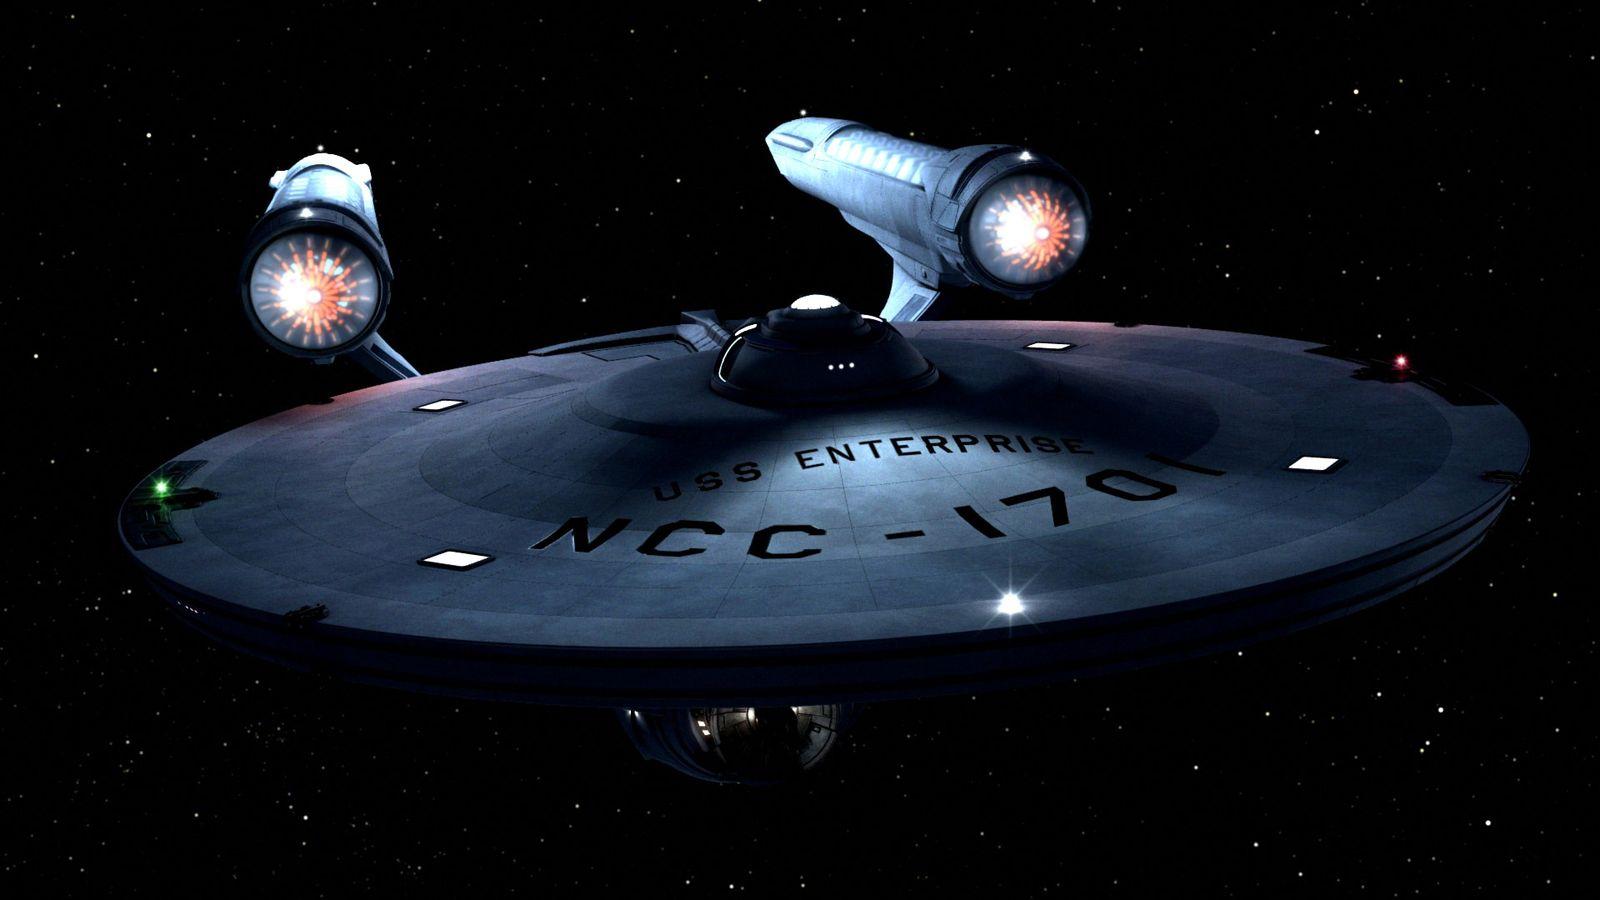 Star Trek Wallpaper Picture Image 1600x900